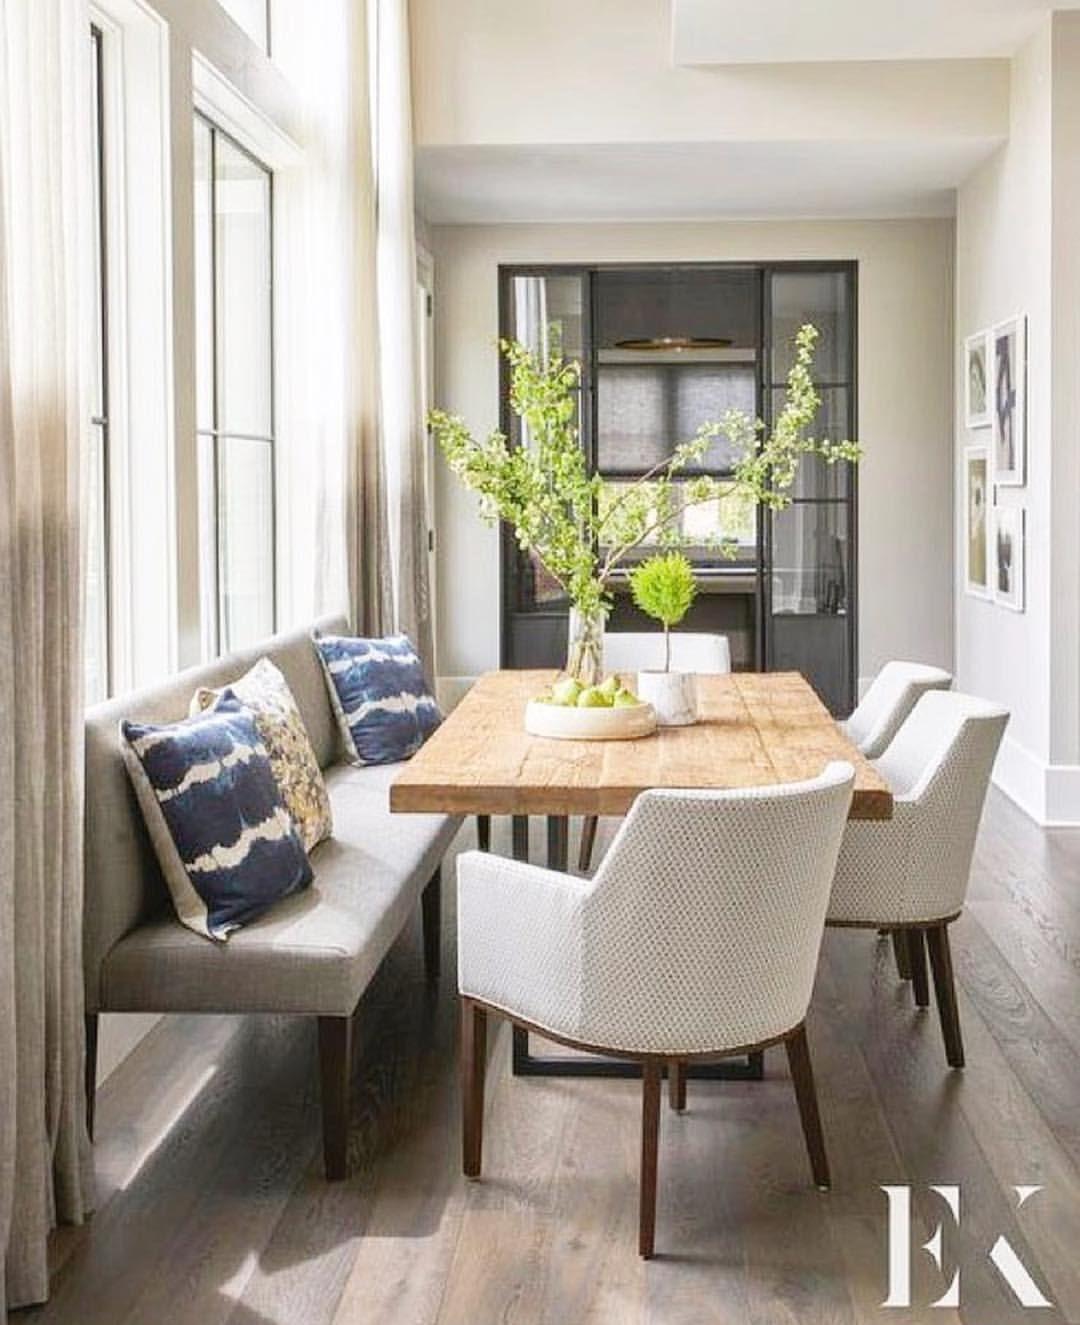 Küchendesign neuer stil window seats  dining room  pinterest  comedores el comedor y